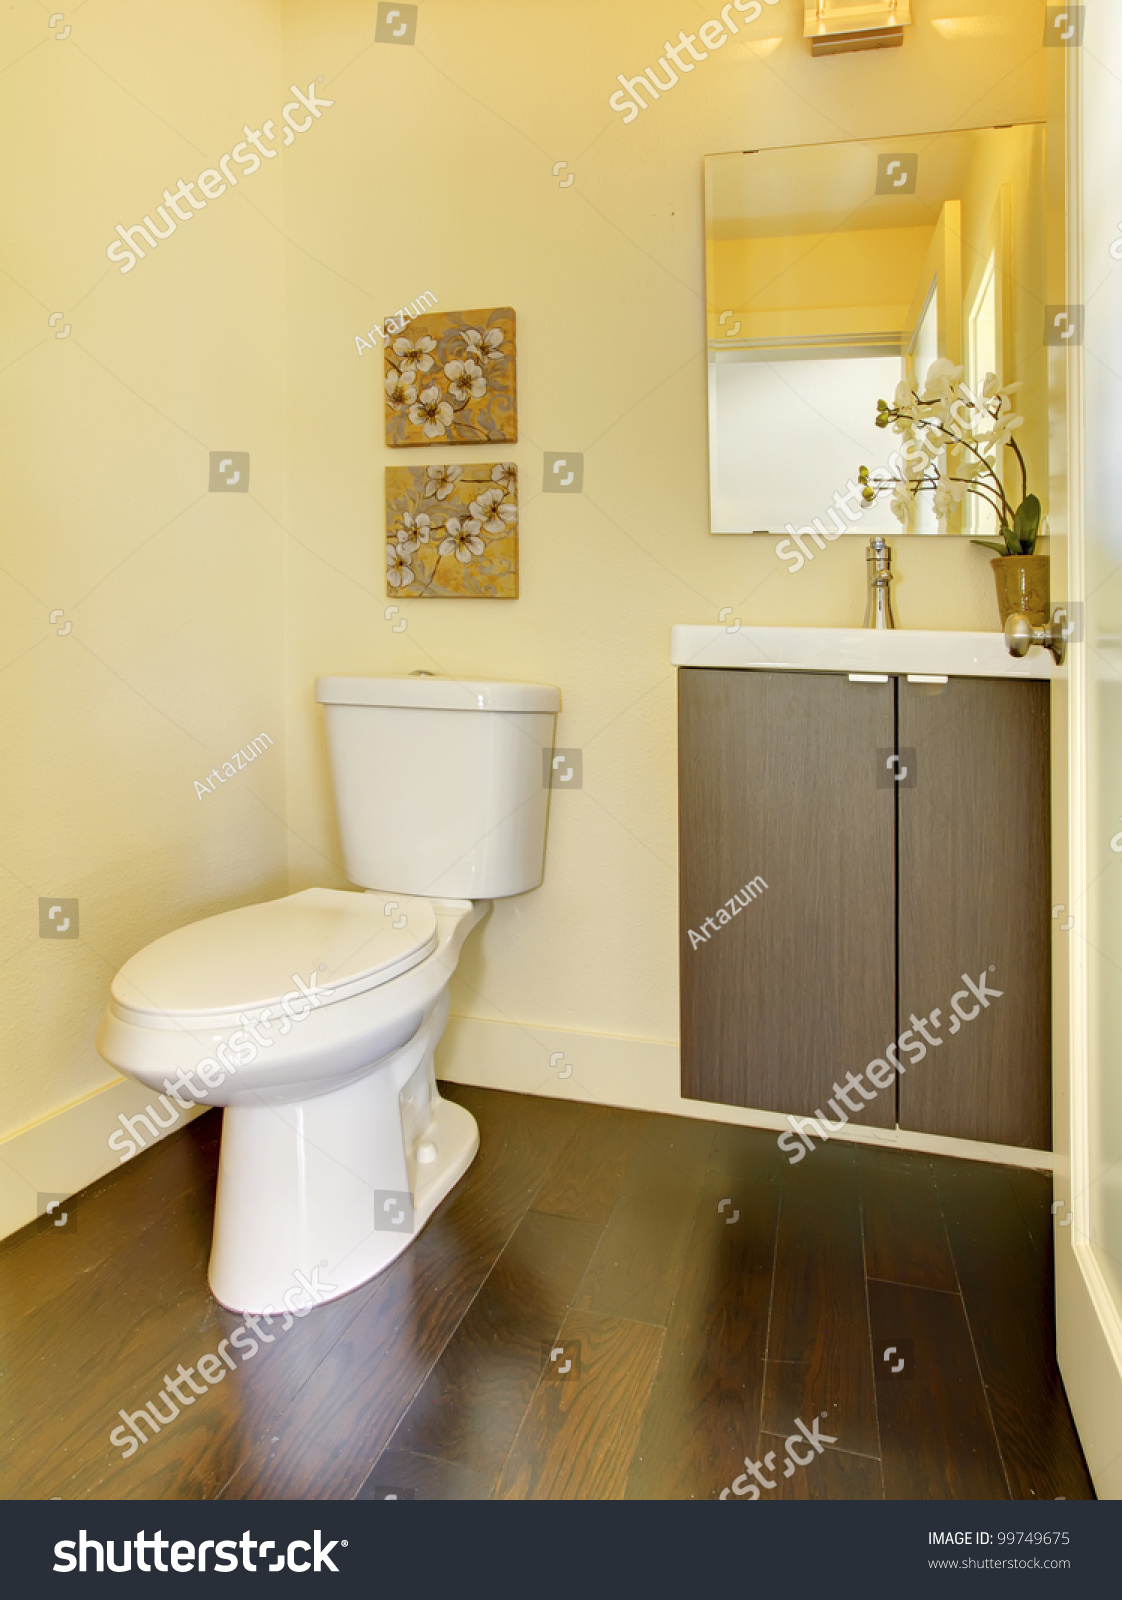 Small New Modern Yellow Bathroom Stock Photo 99749675